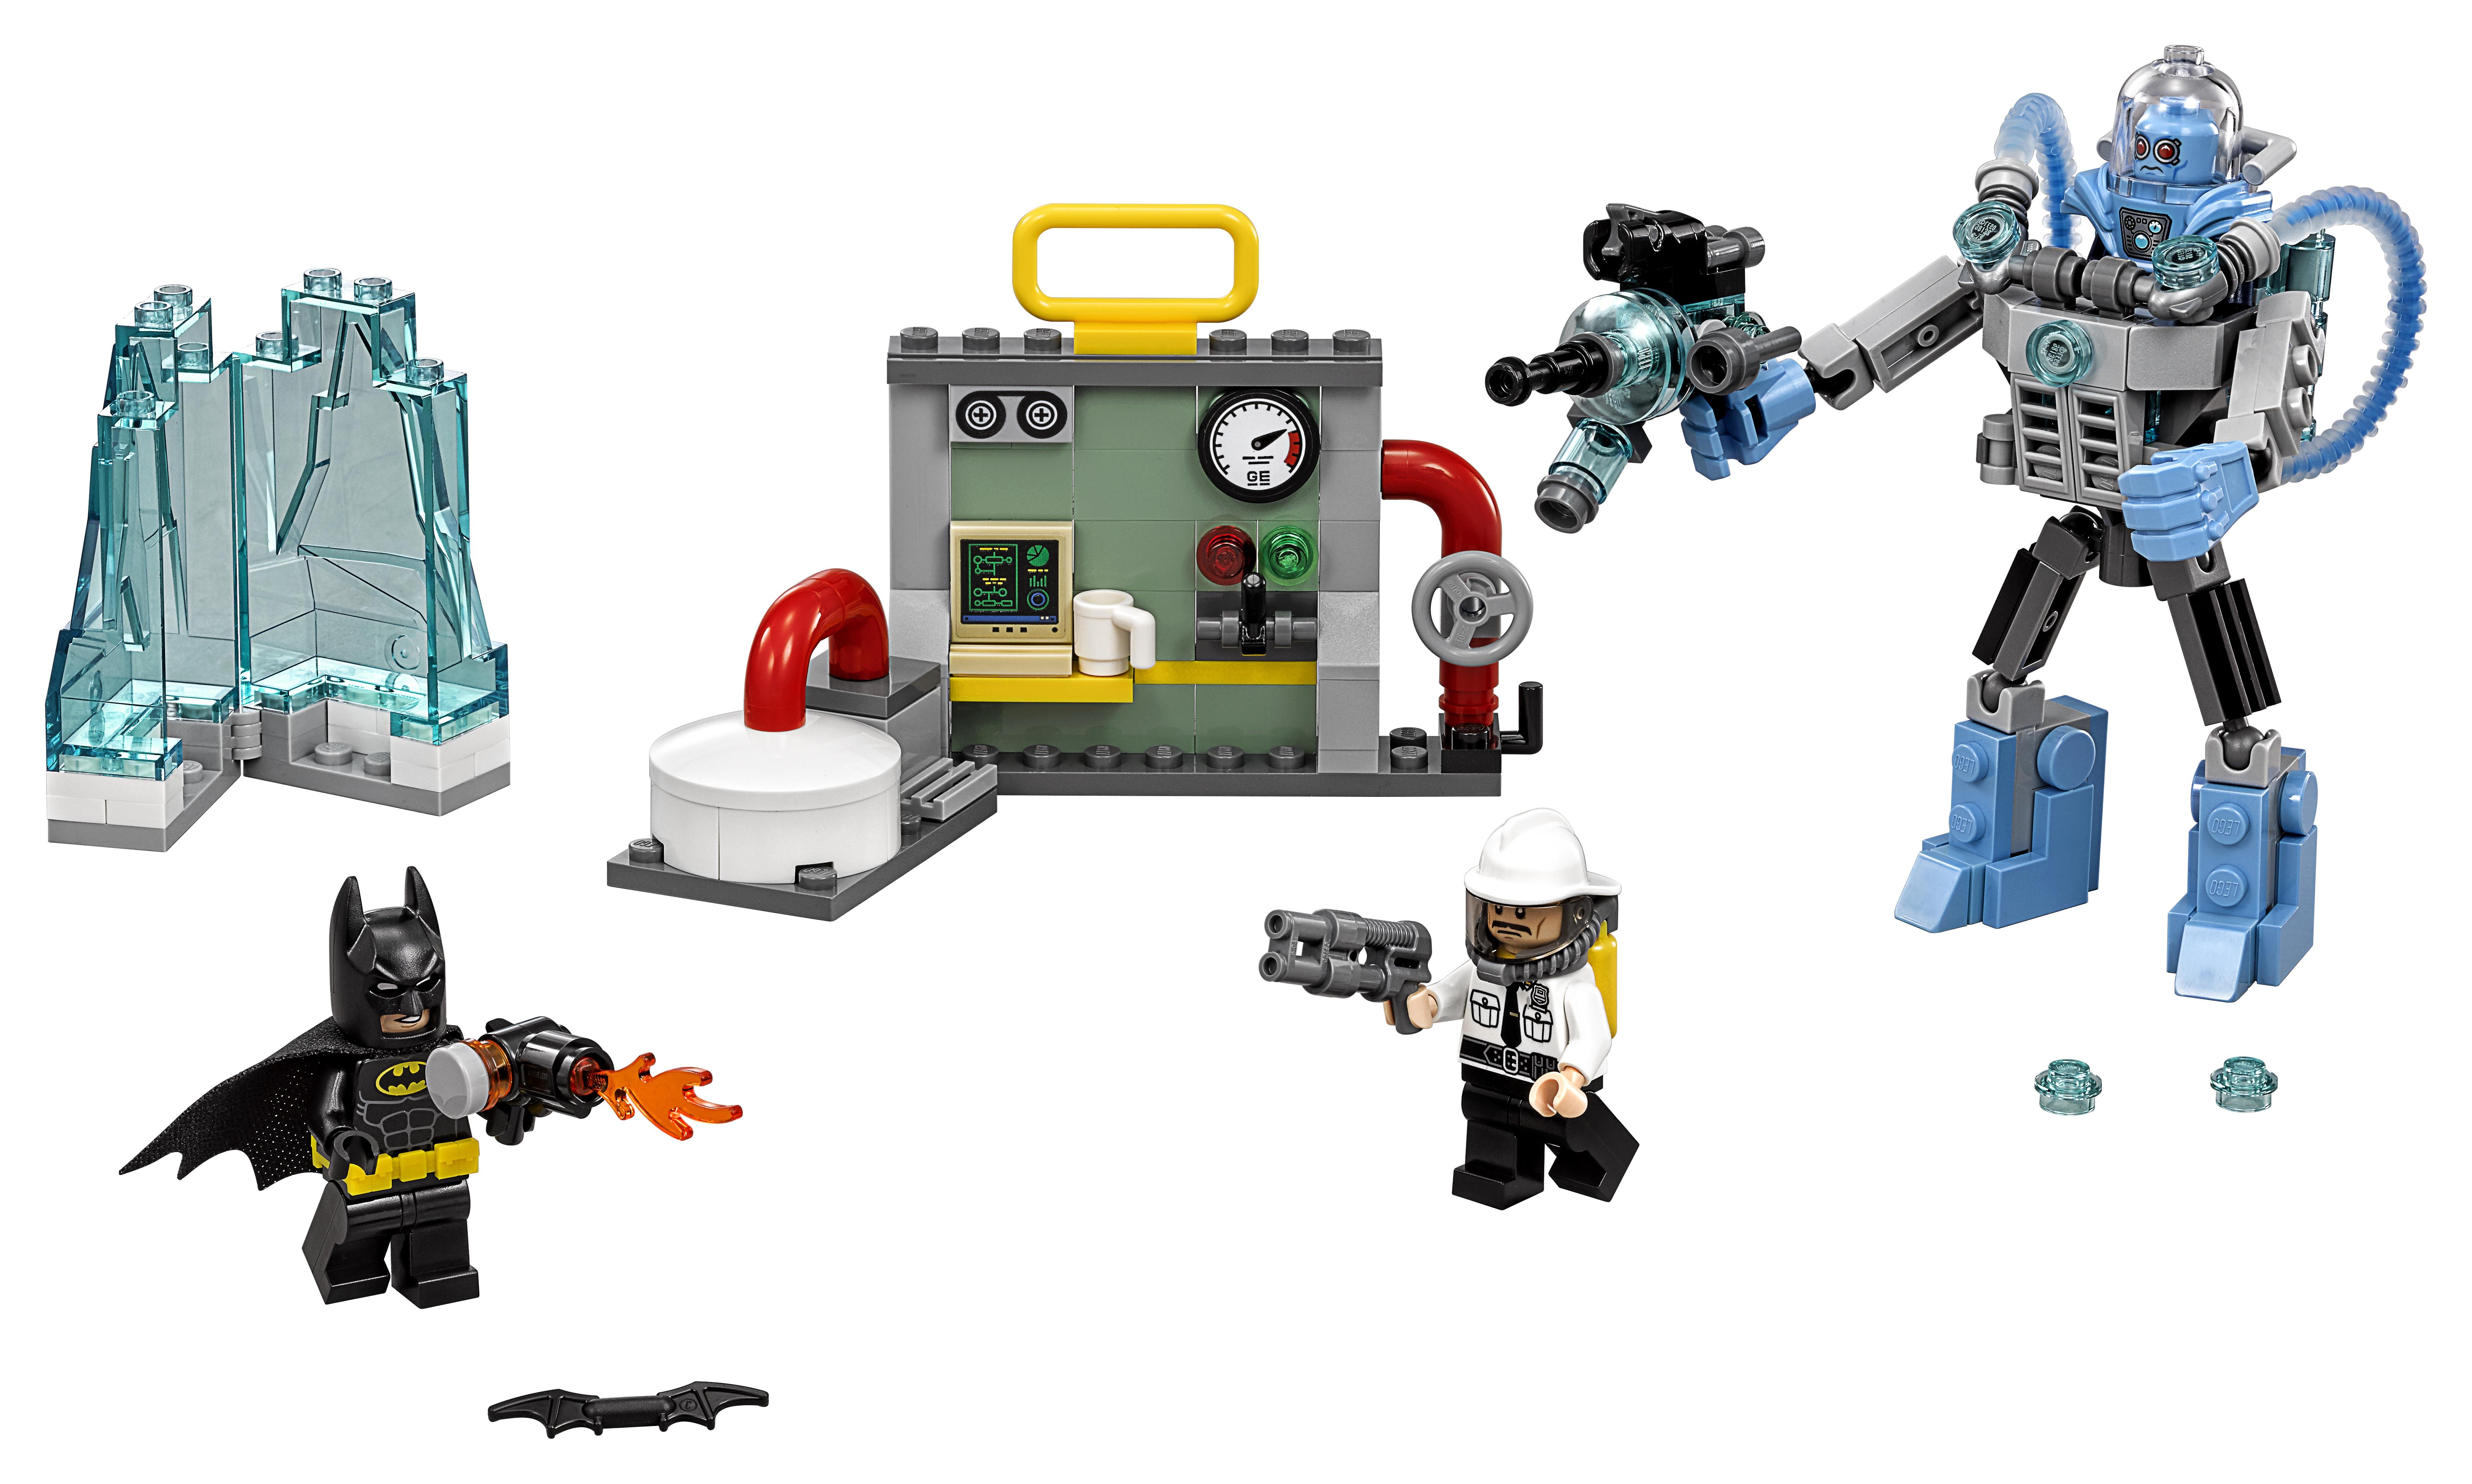 Конструктор LEGO Batman Movie 70901 Ледяная aтака Мистера Фриза lepin new 460pcs 07051 batman movie series the killer crocodile tail gator 70907 building blocks bricks educational toys